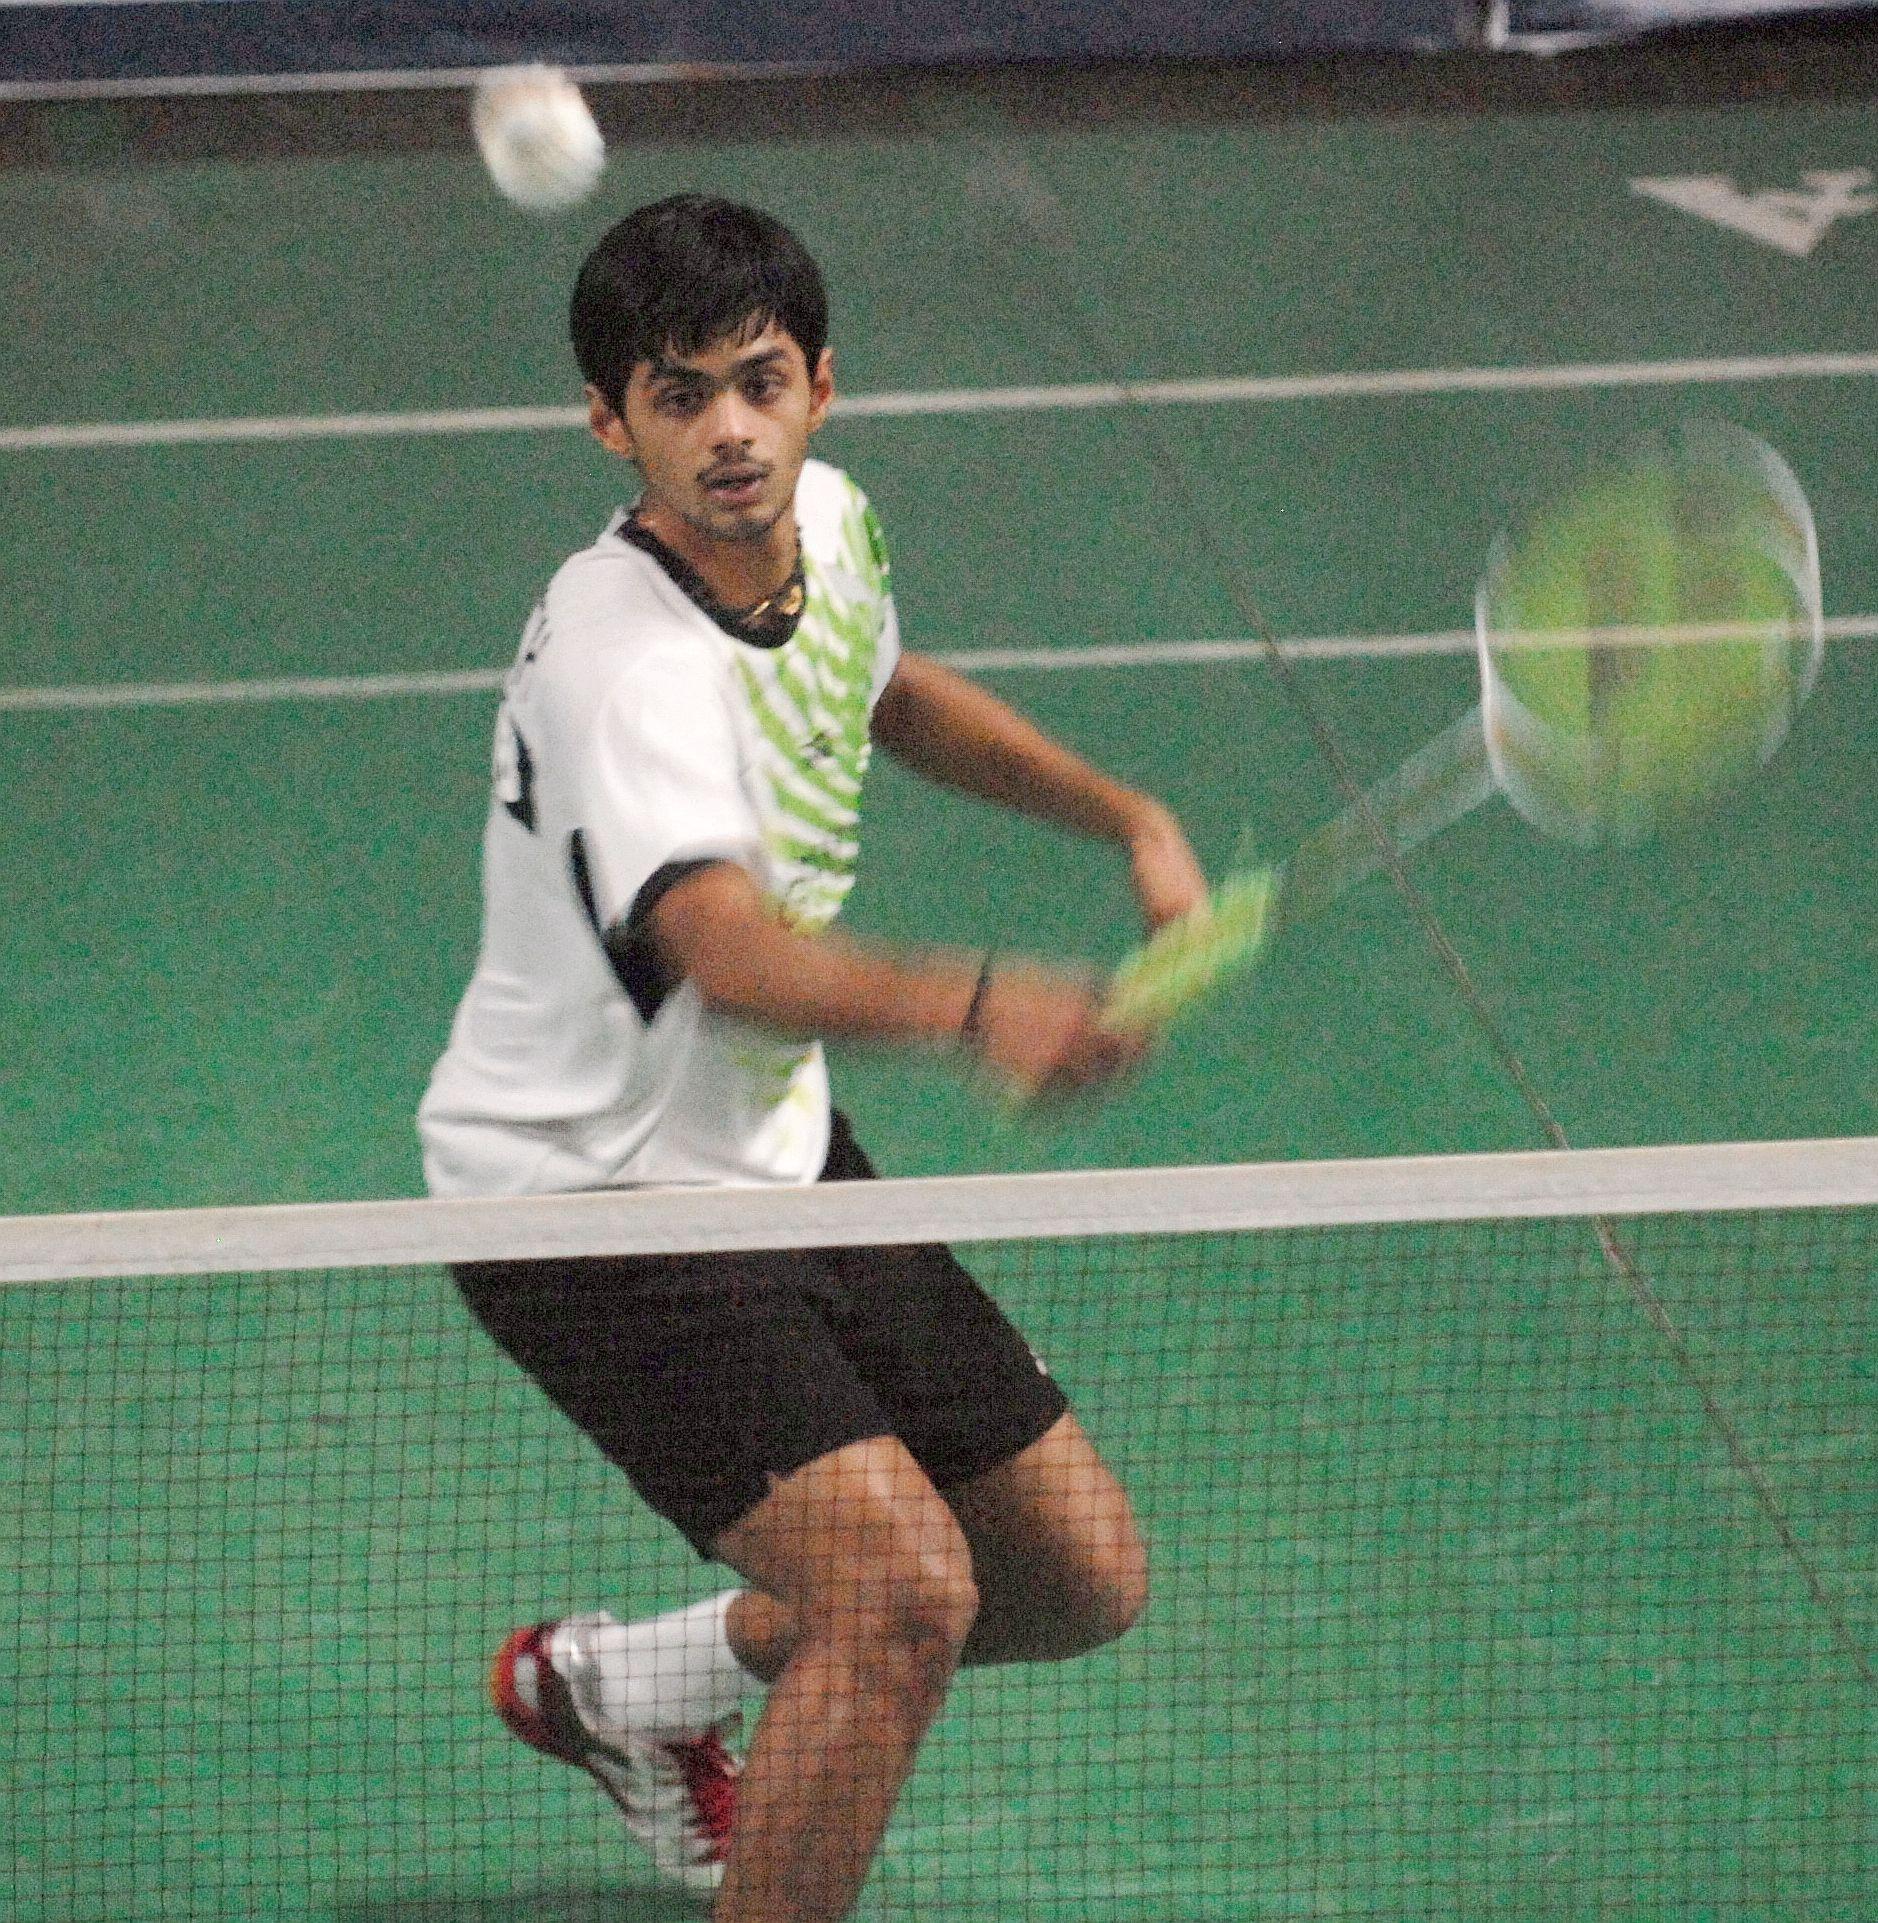 Sai Praneeth Fights Back to Win